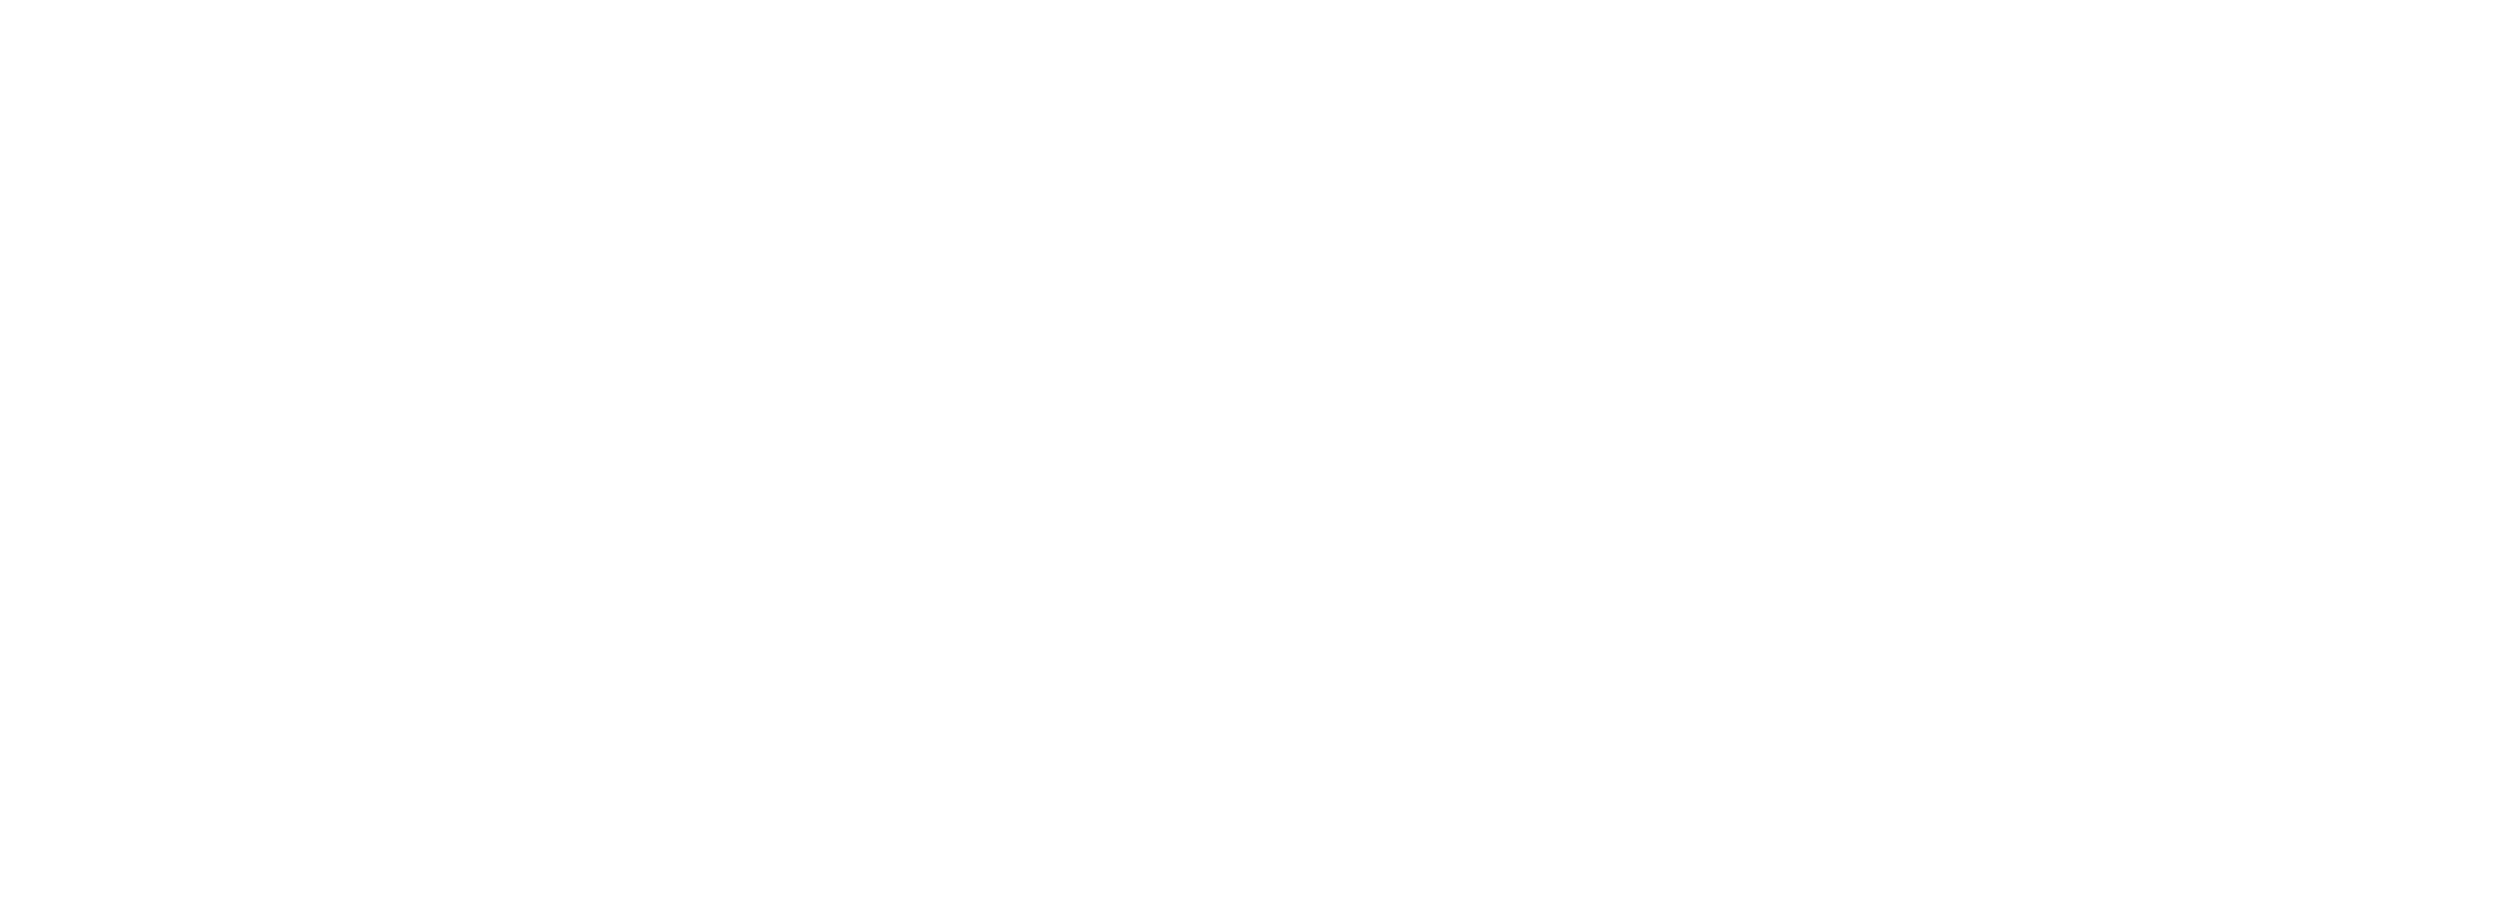 Matt-Scobel-white-hiRes (no tagline).png